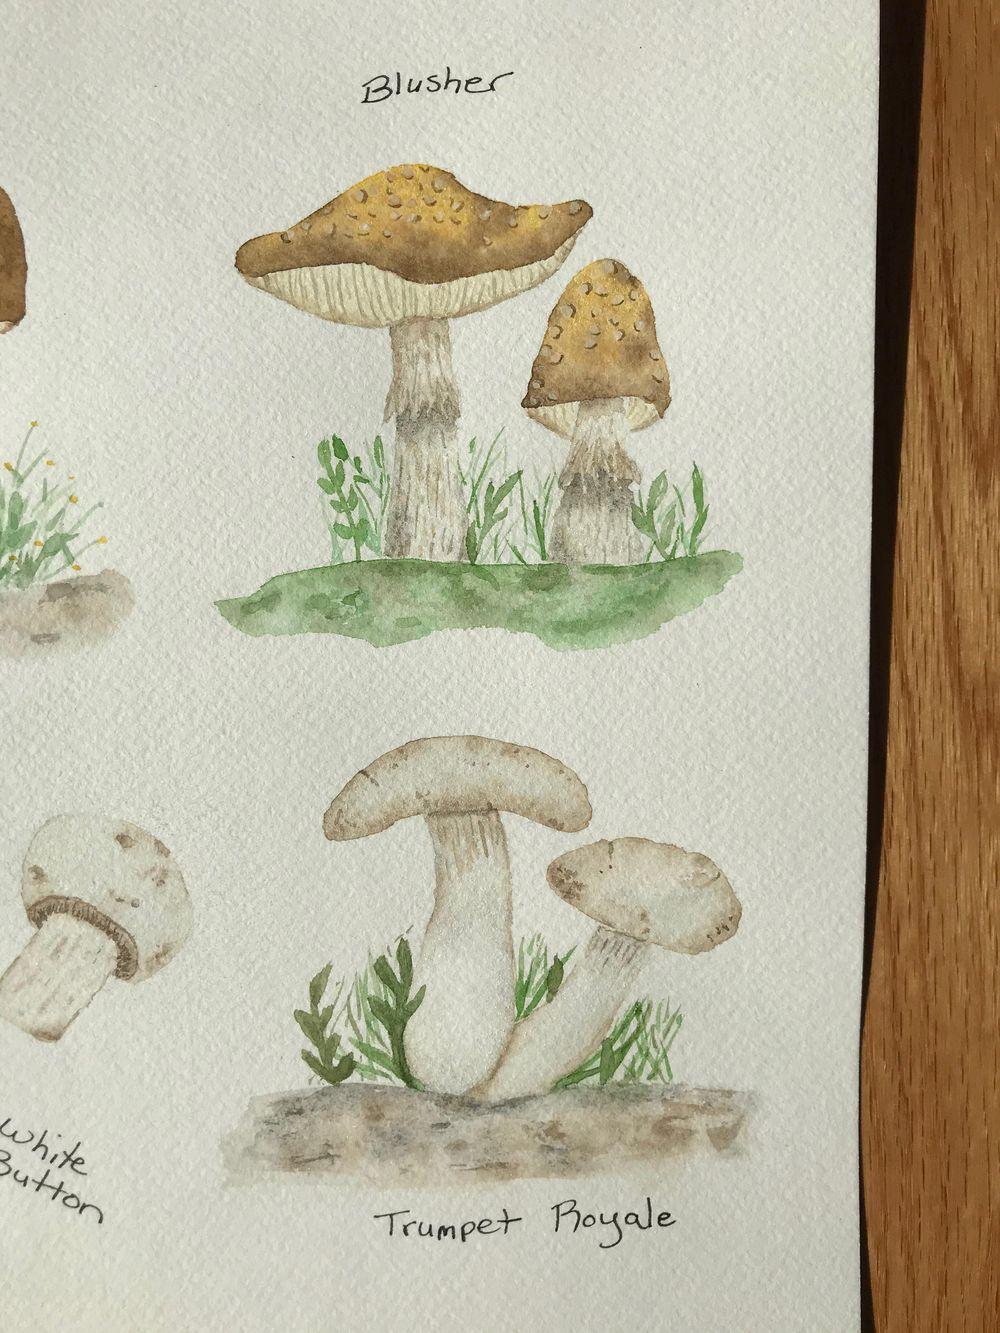 Mushrooms - image 3 - student project